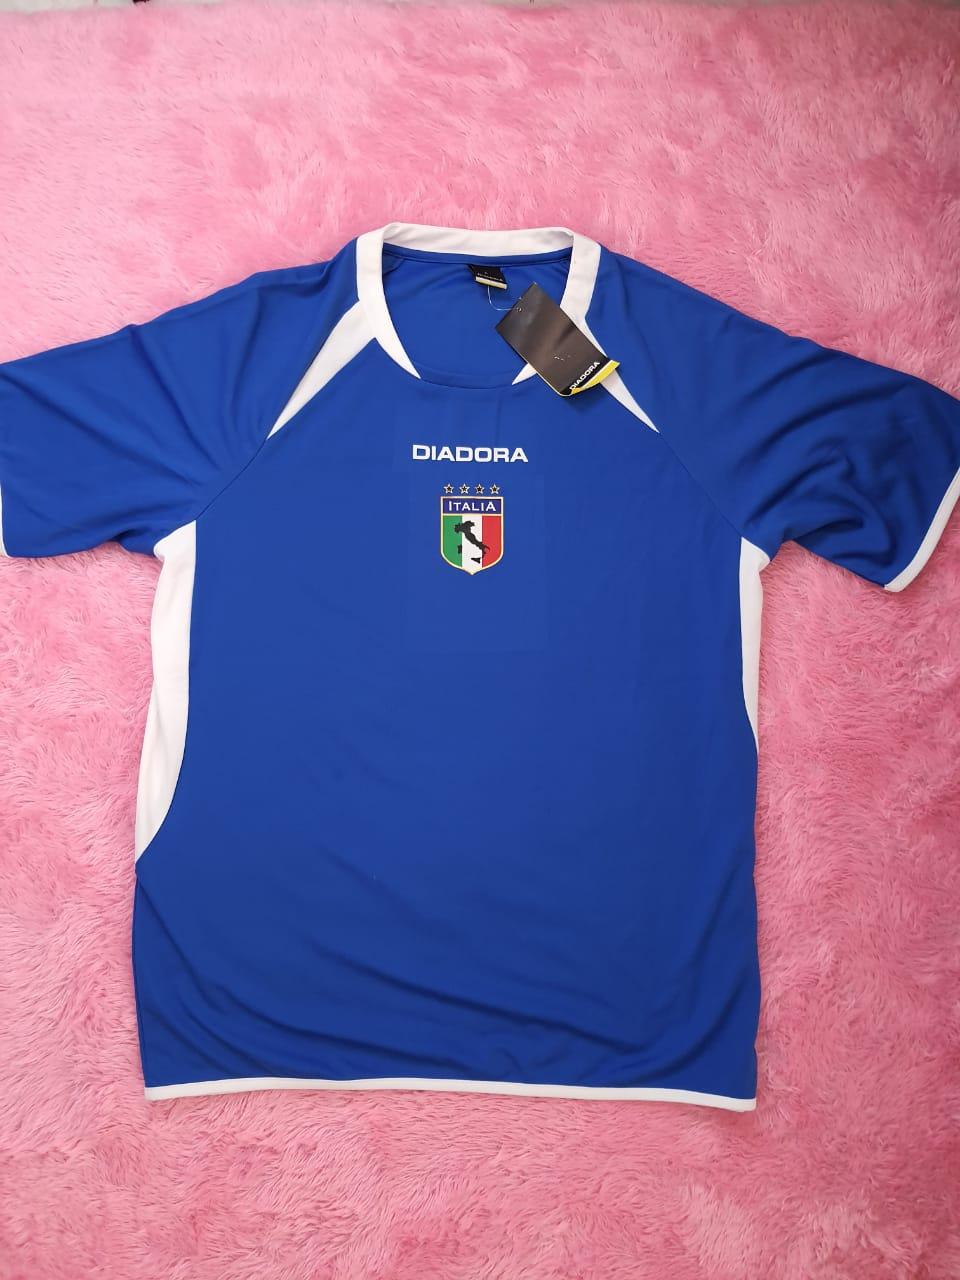 Jersey Diadora Retro Italy (Original)